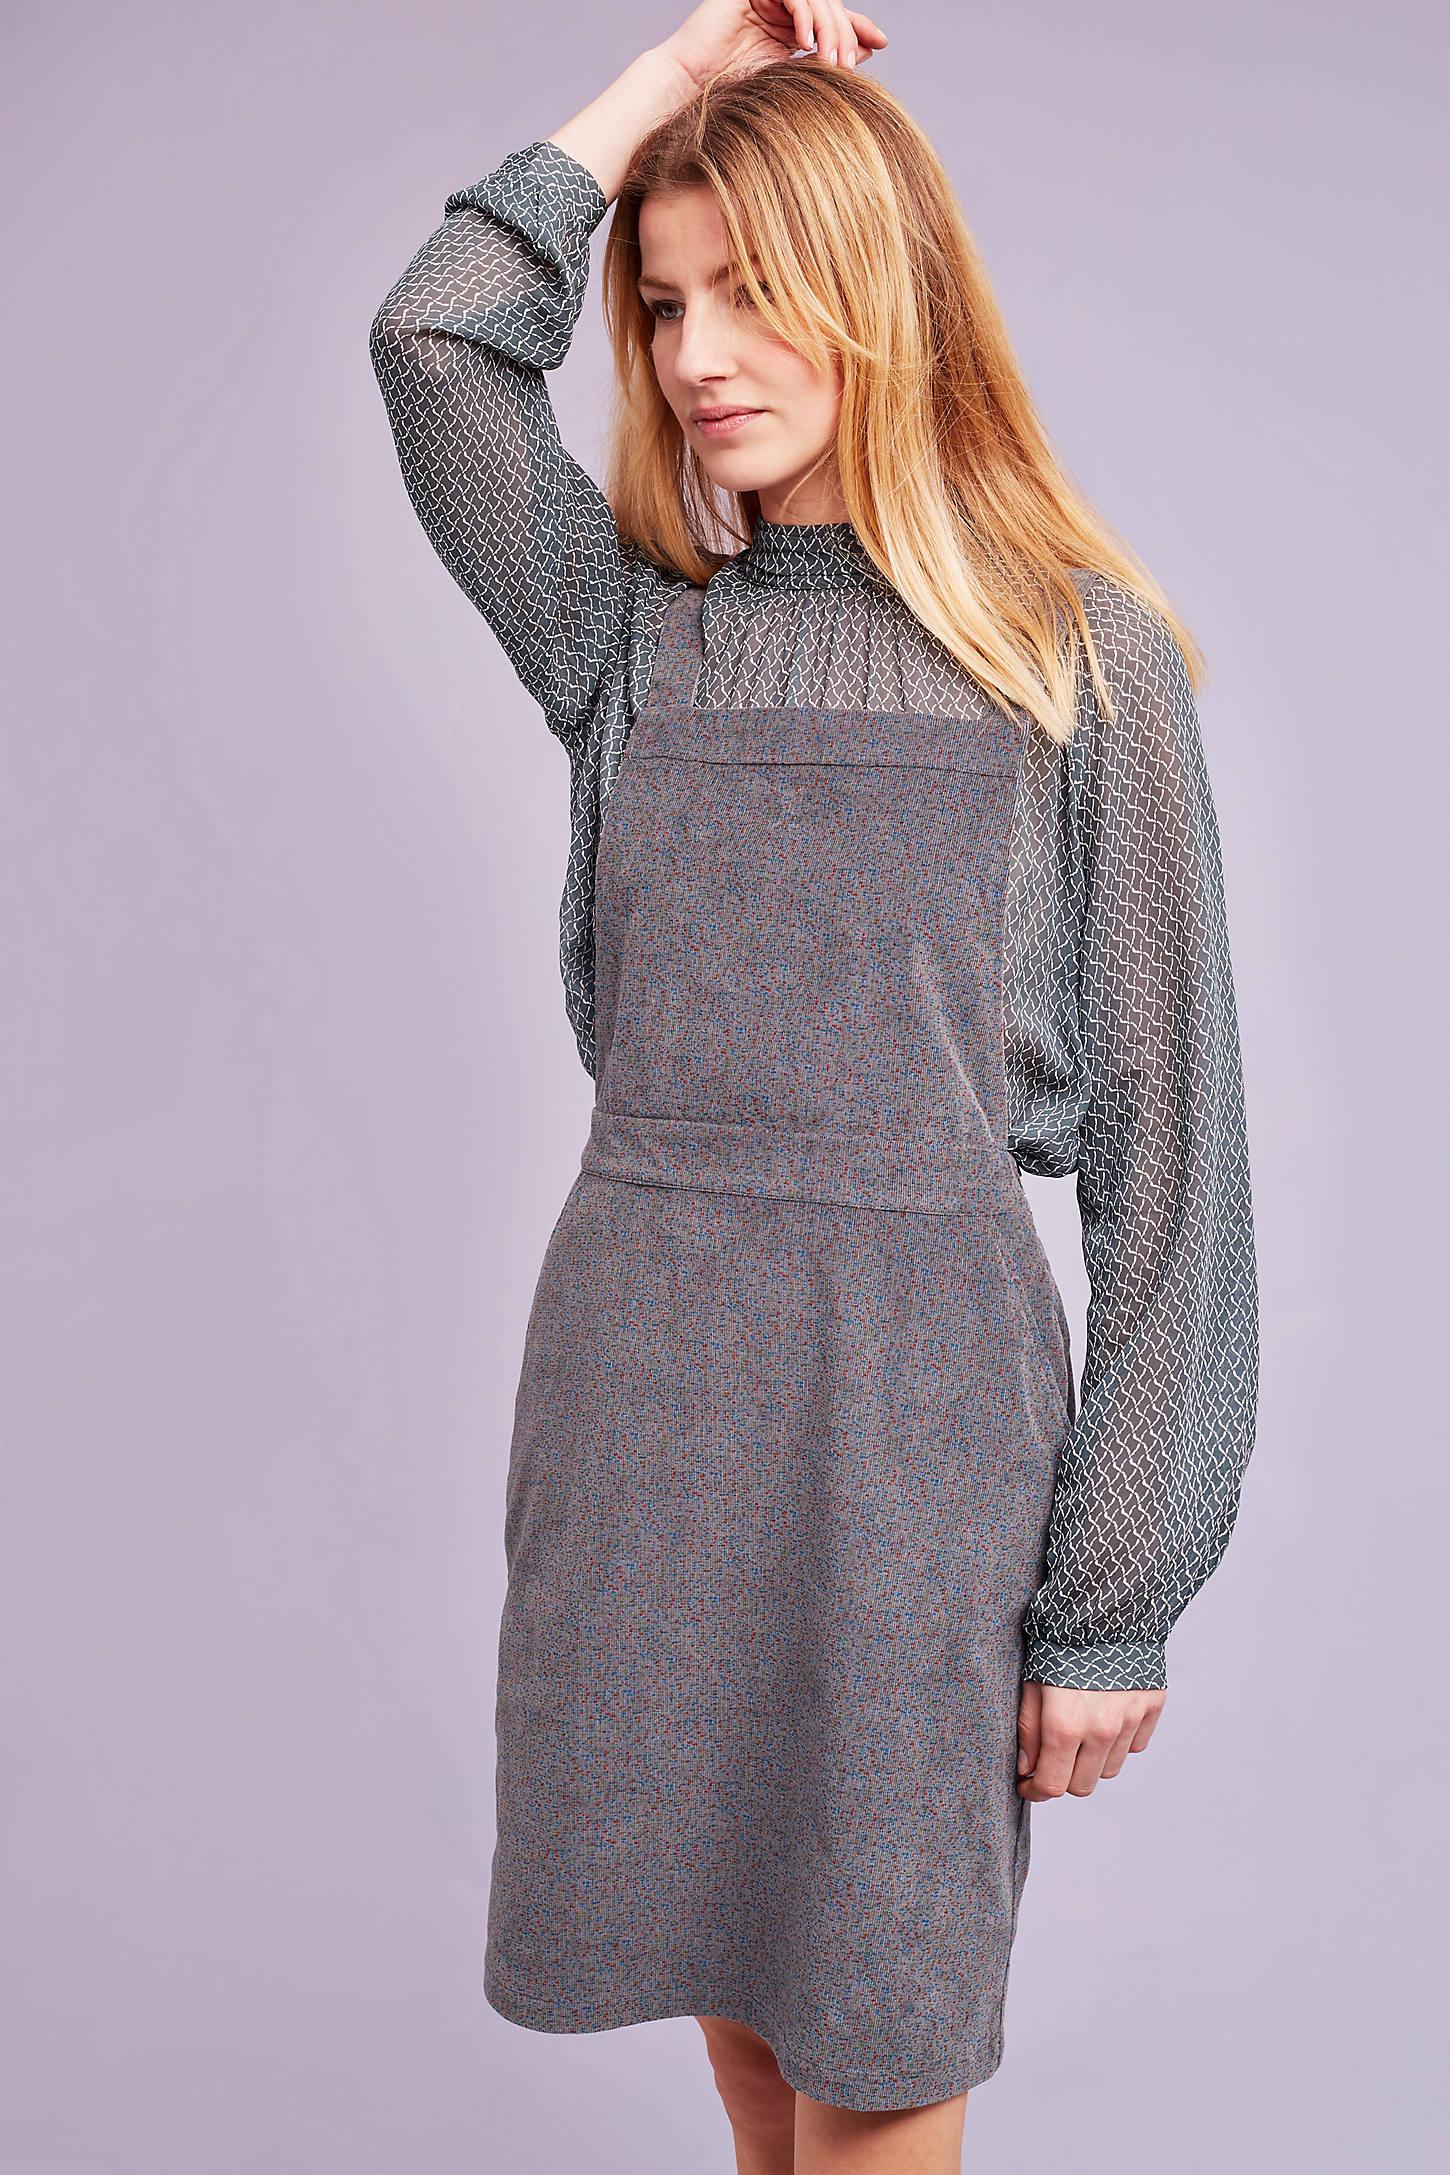 Aubrey Corduroy Pinafore Dress, Grey